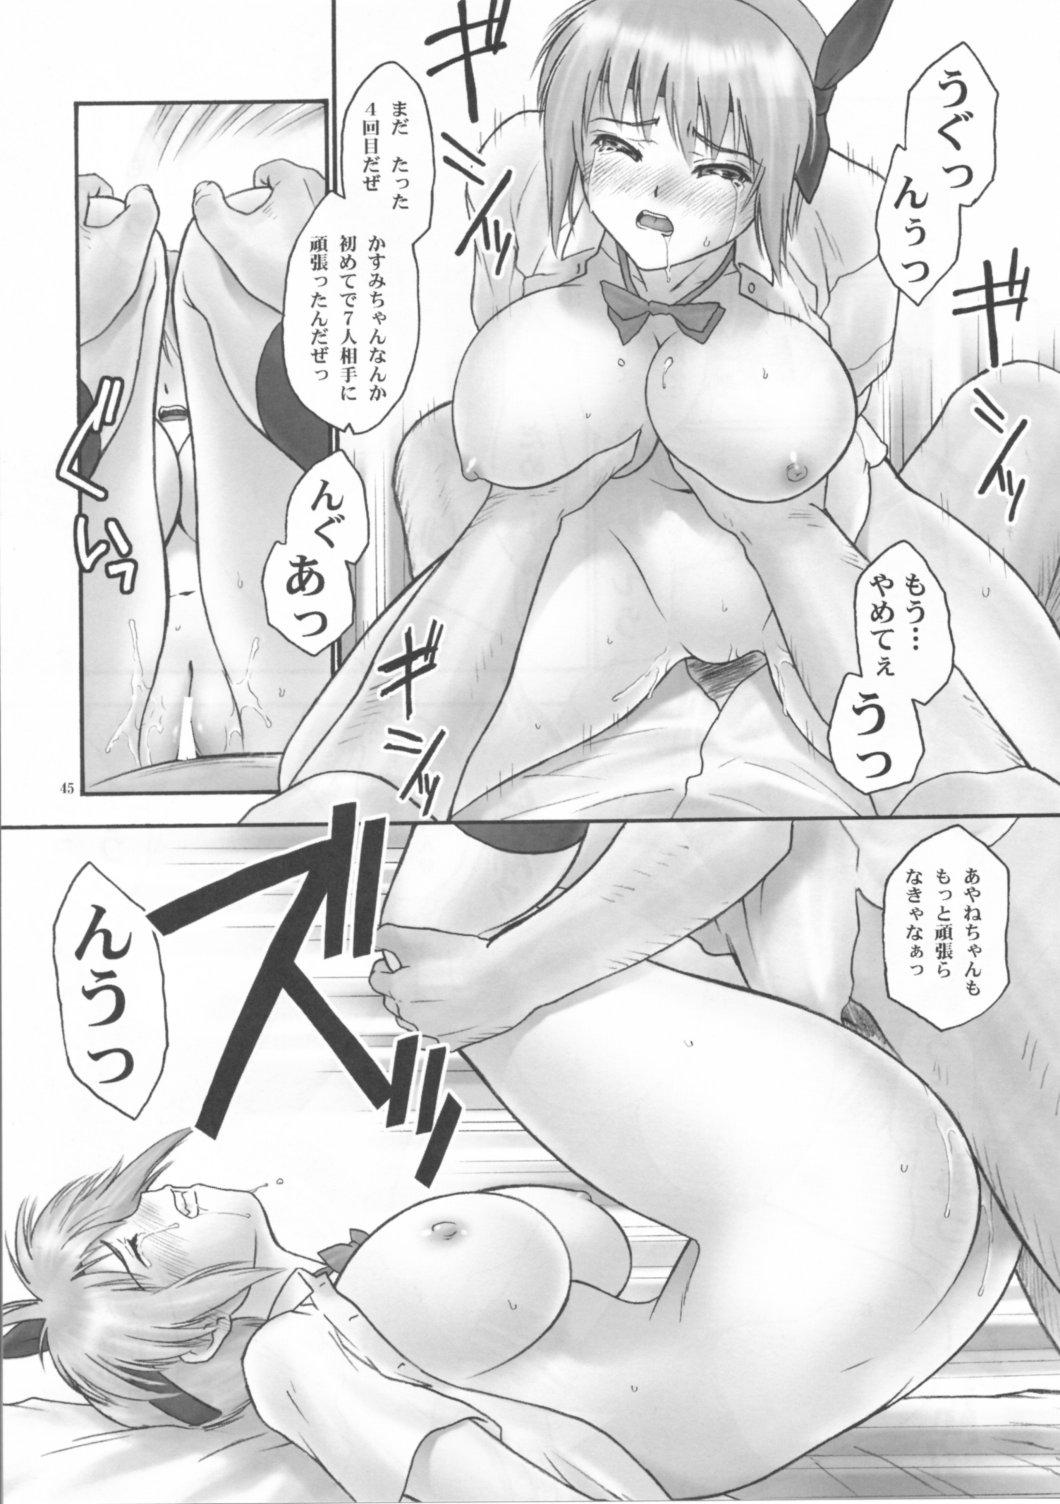 (C72) [Hellabunna (Iruma Kamiri)] REI - slave to the grind - CHAPTER 04: SURGE (Dead or Alive) 43